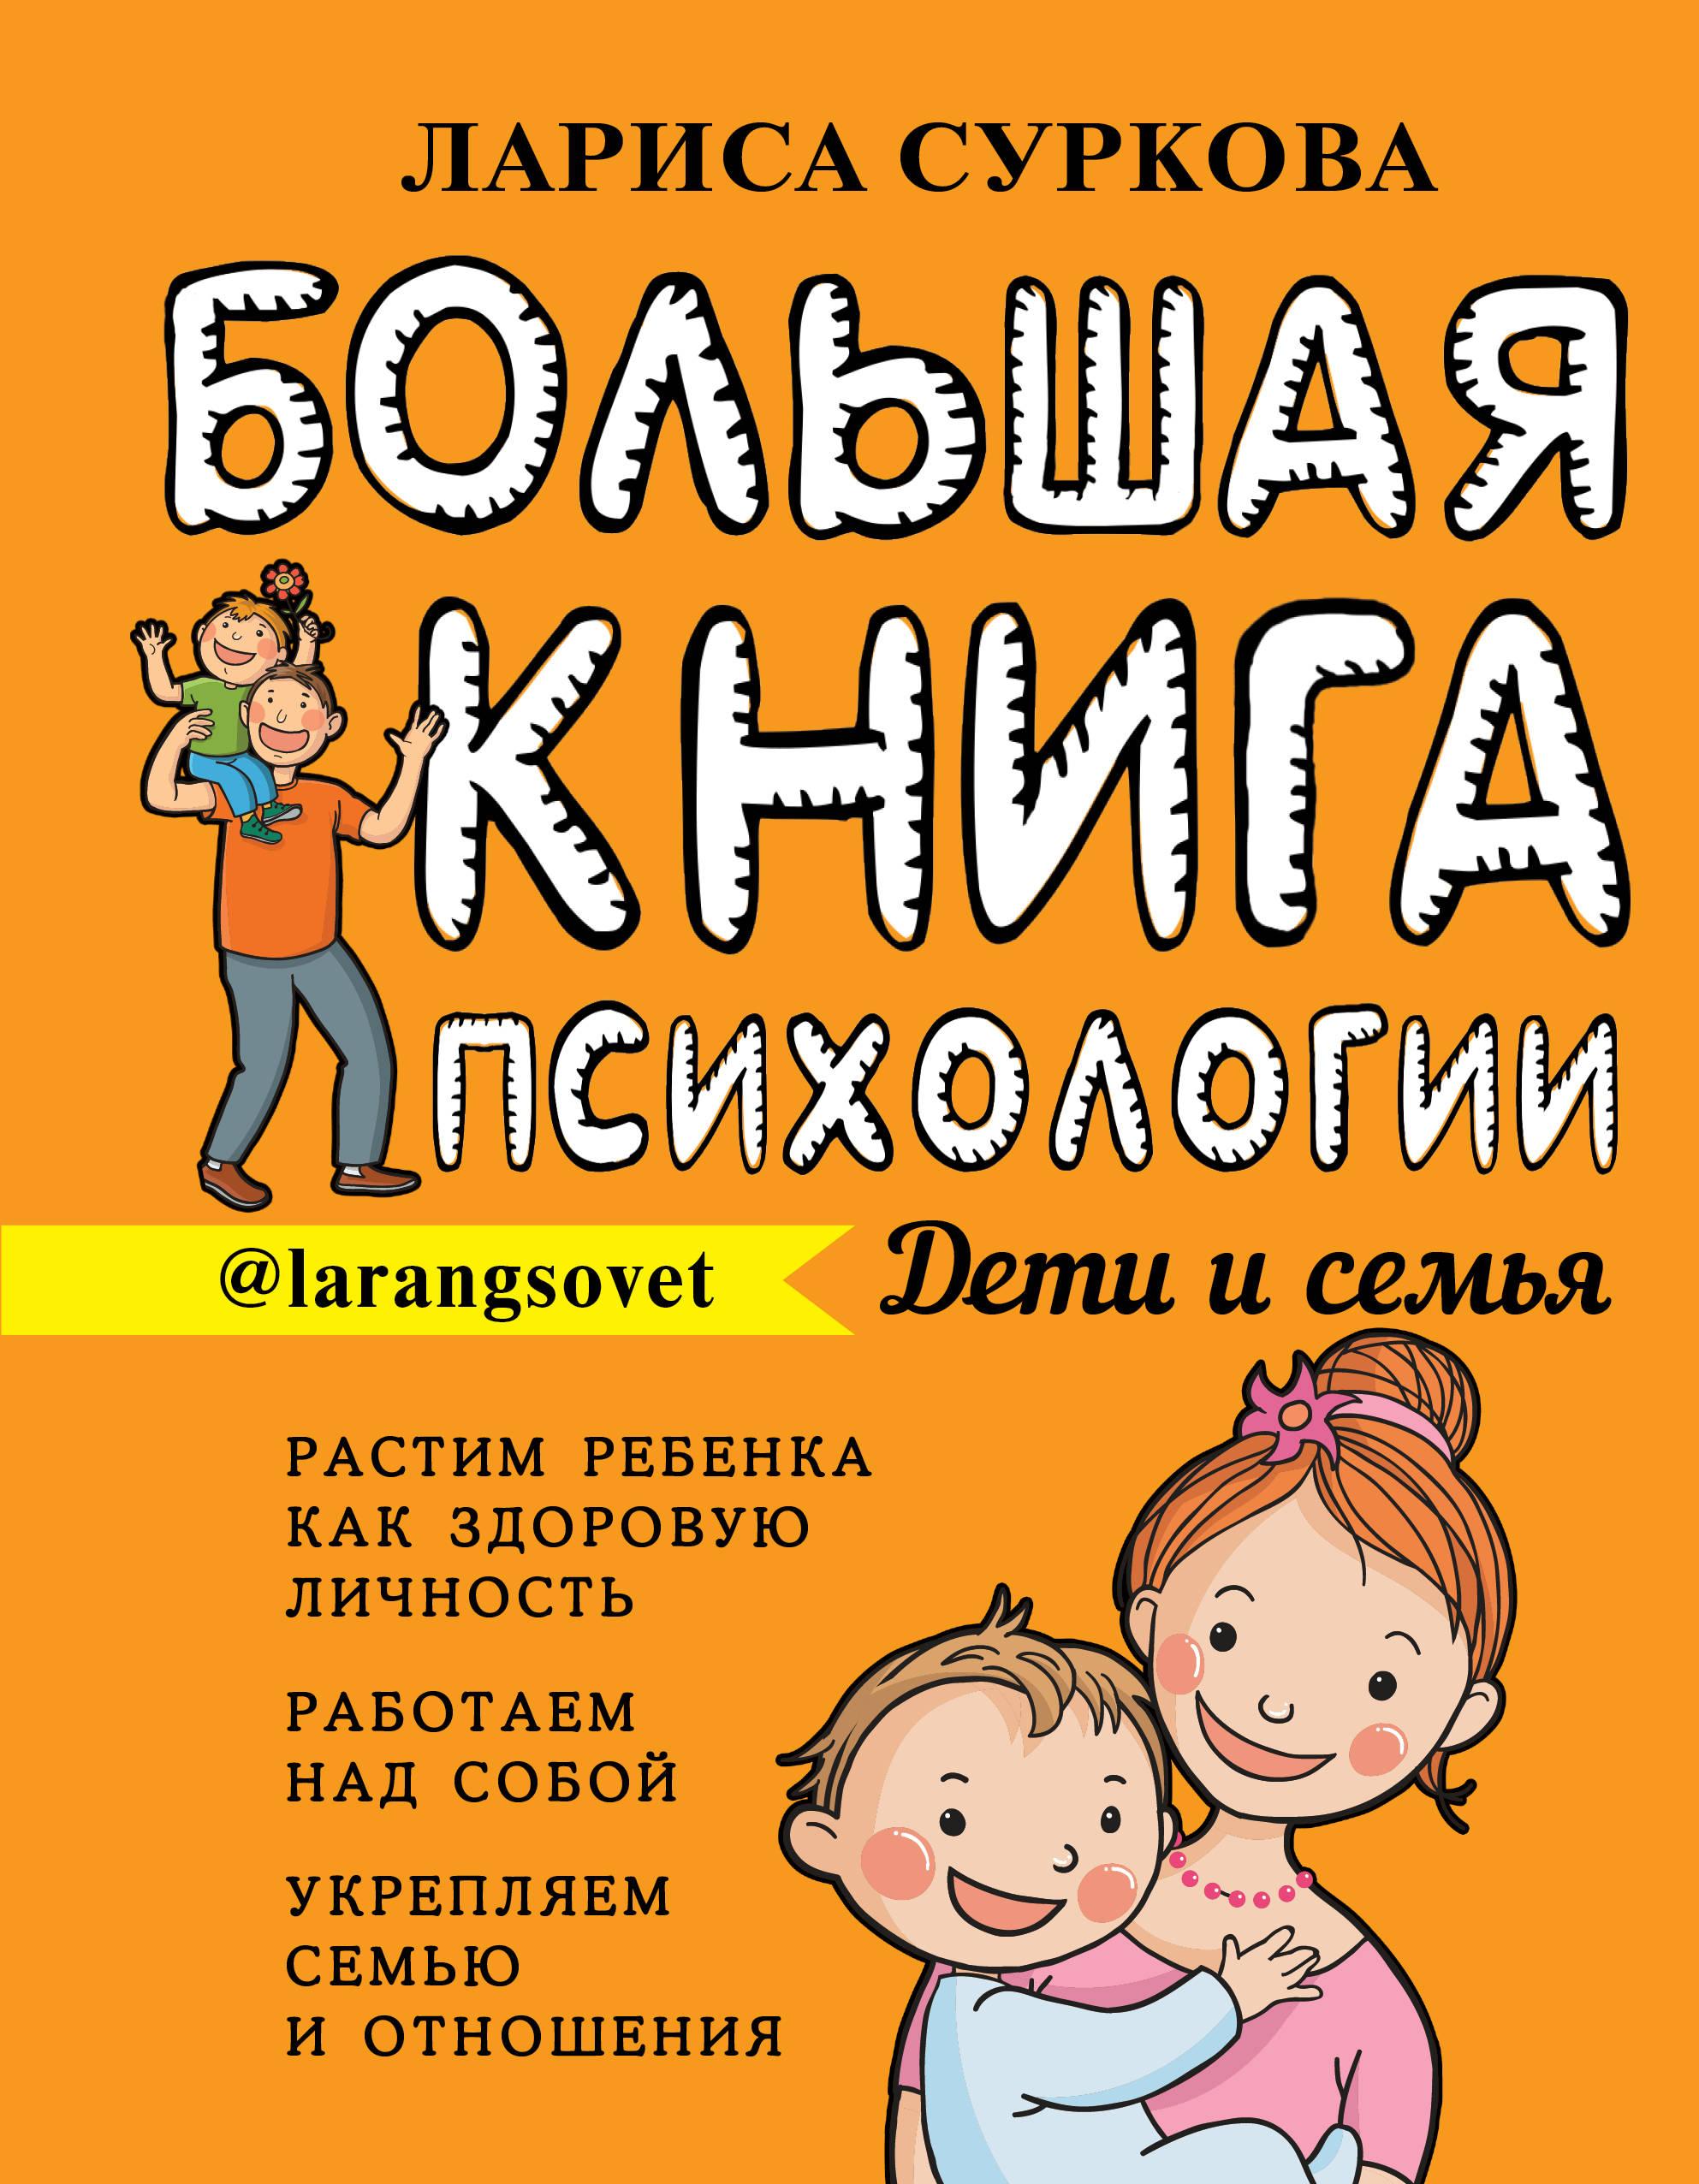 Bolshaja kniga psikhologii: deti i semja